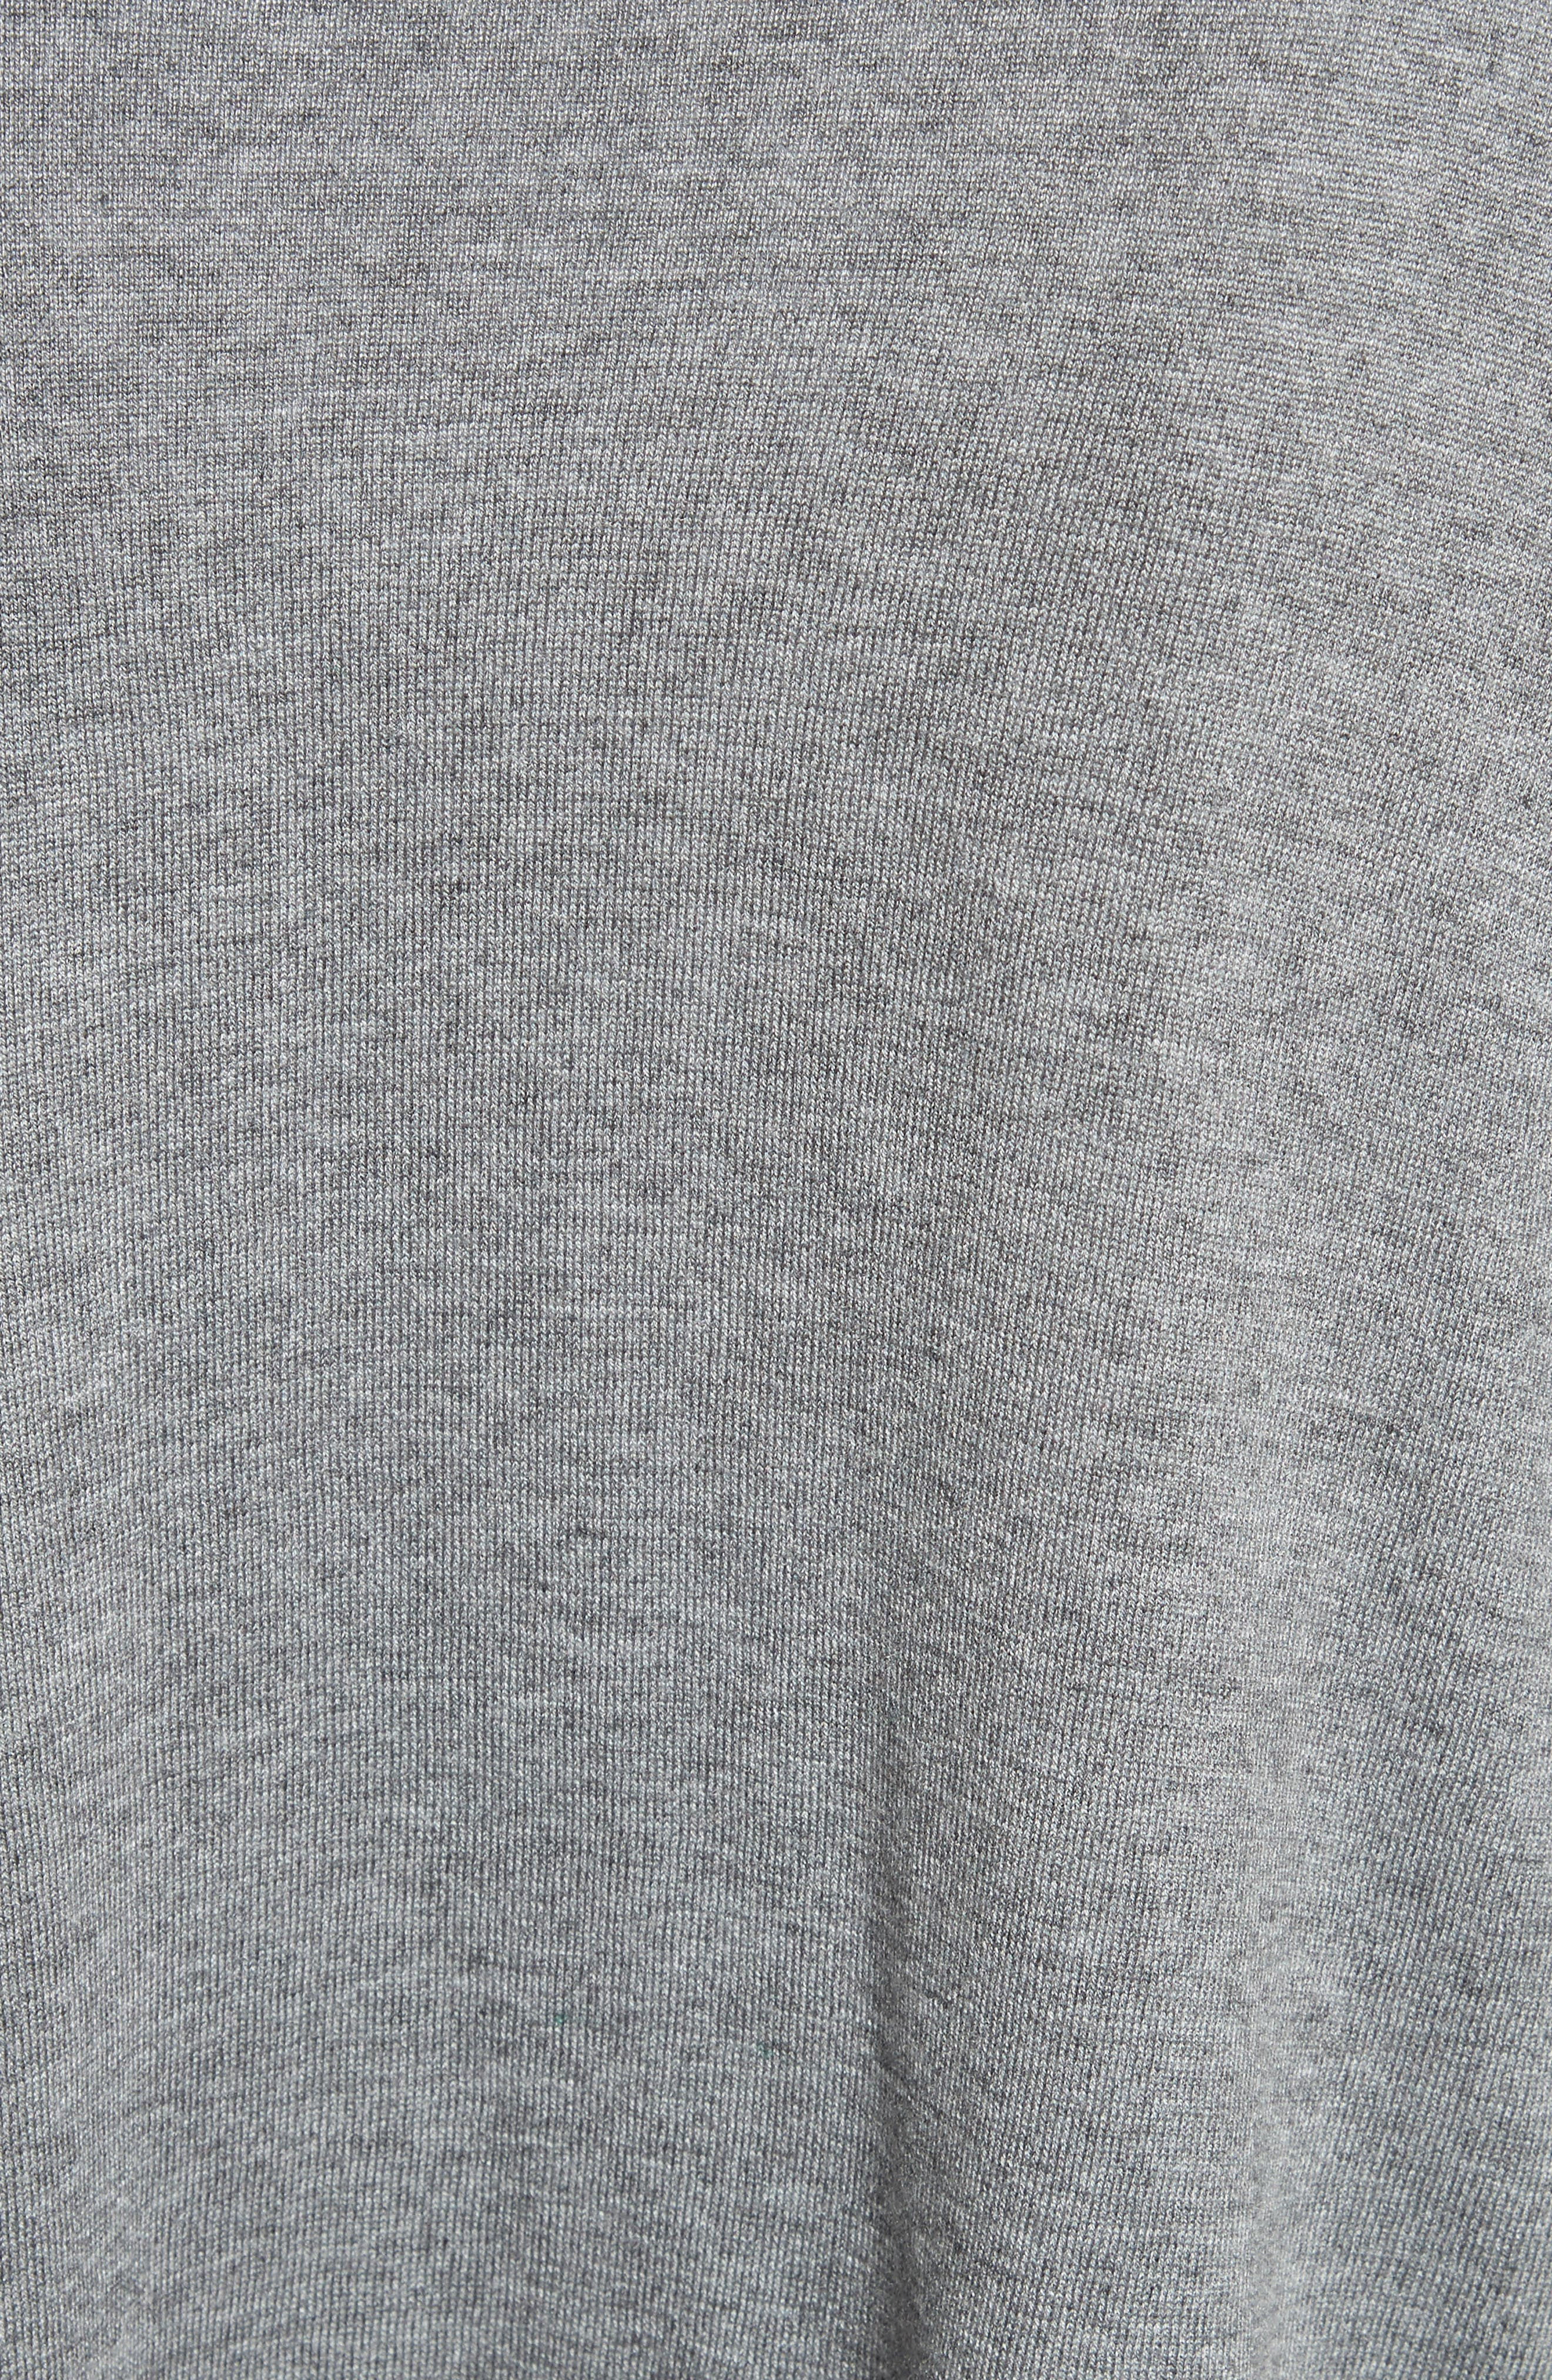 Modal Blend V-Neck Cardigan,                             Alternate thumbnail 5, color,                             071